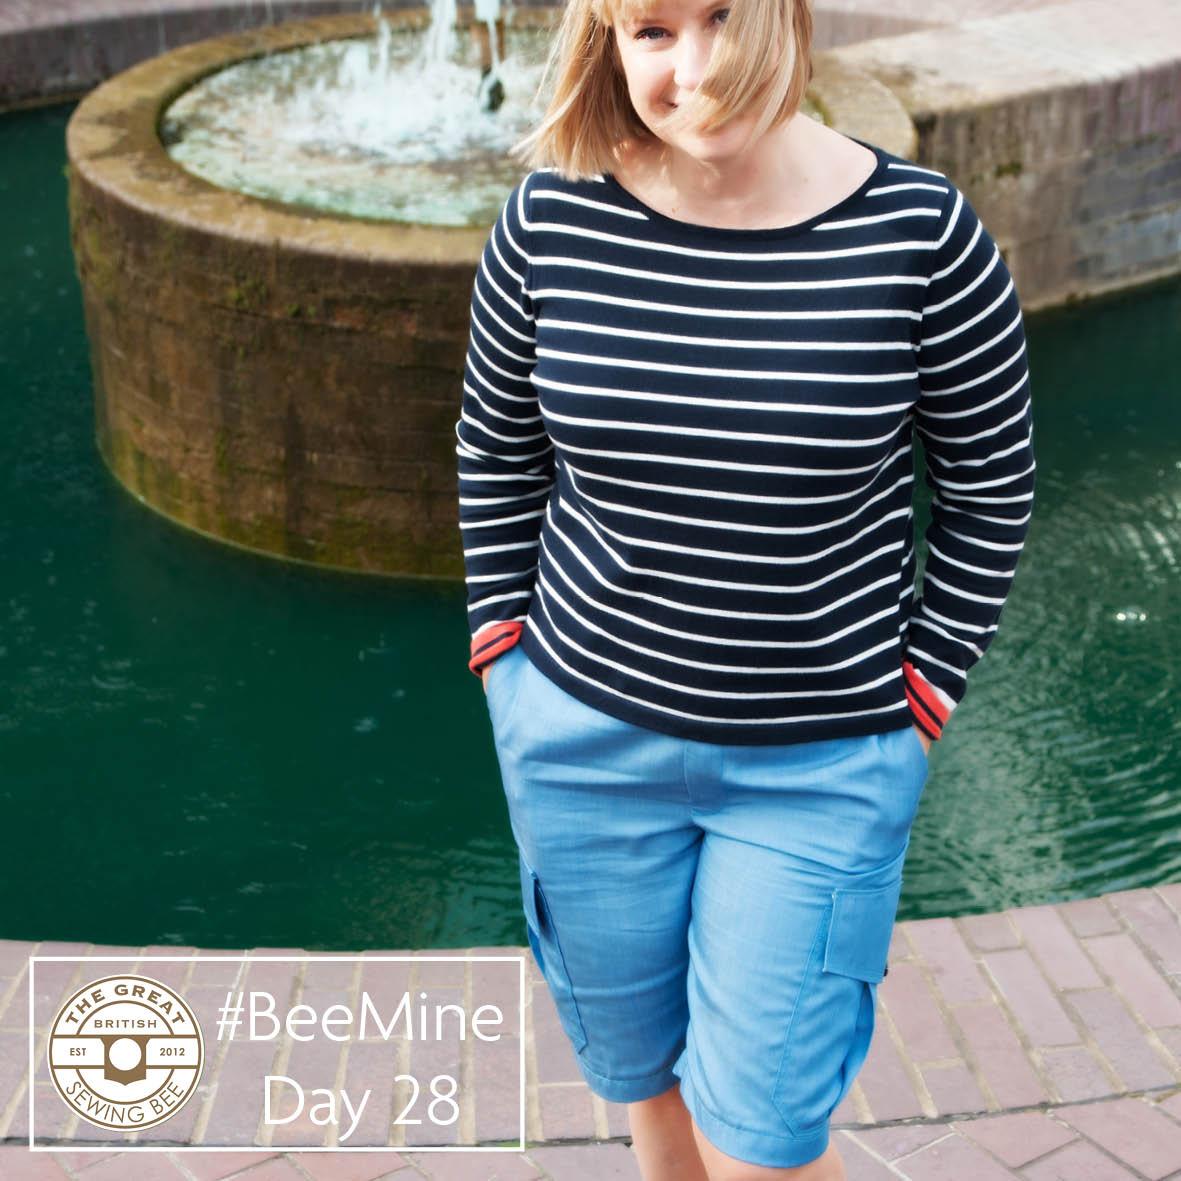 Day 28 #BeeMine- My 30 day blog challenge- Fashion With Fabric